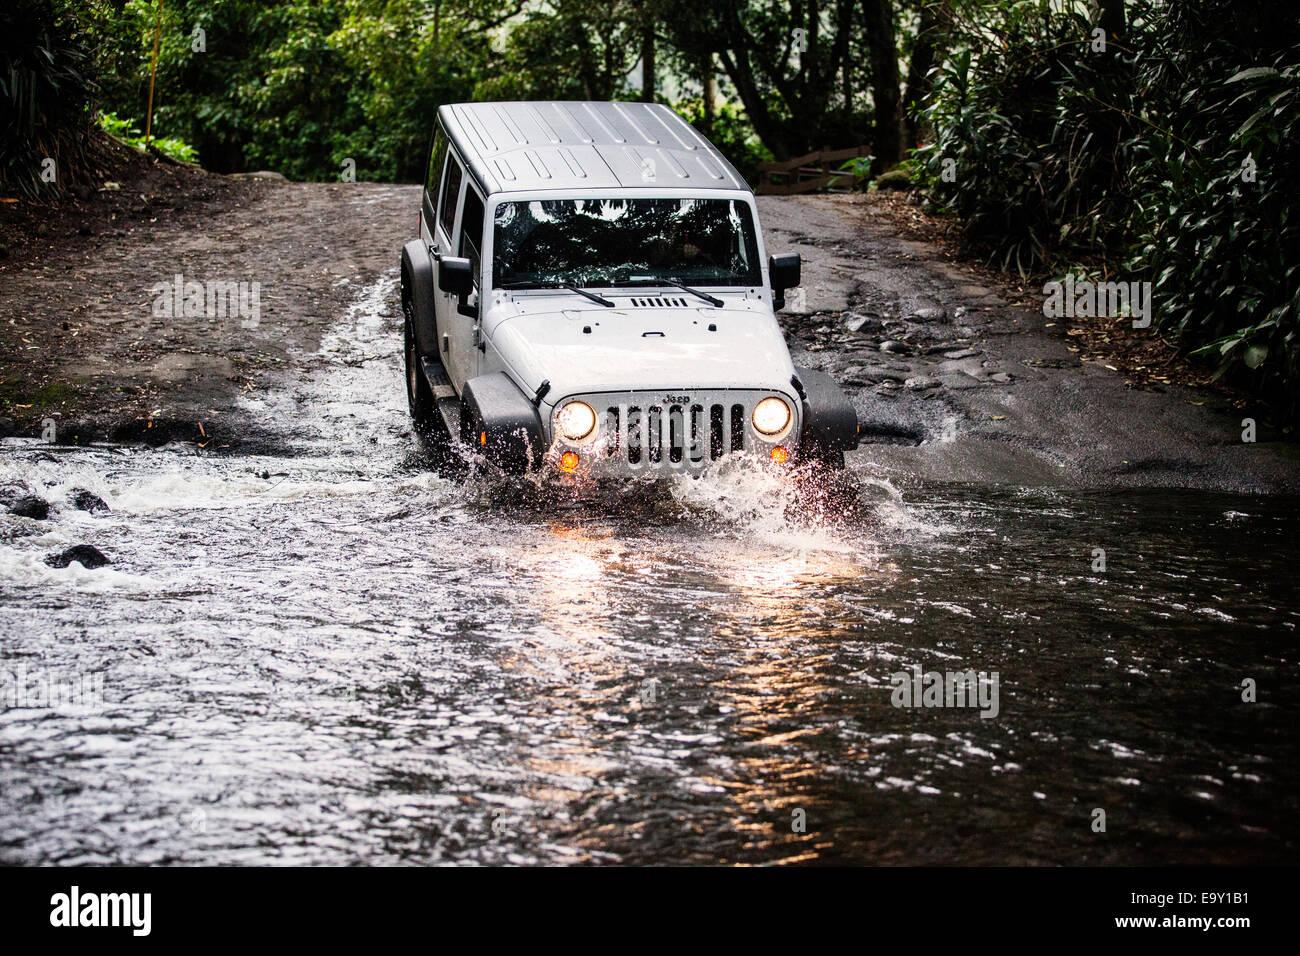 Jeep crossing a stream in Waipio Valley, Big Island, Hawaii, United States - Stock Image